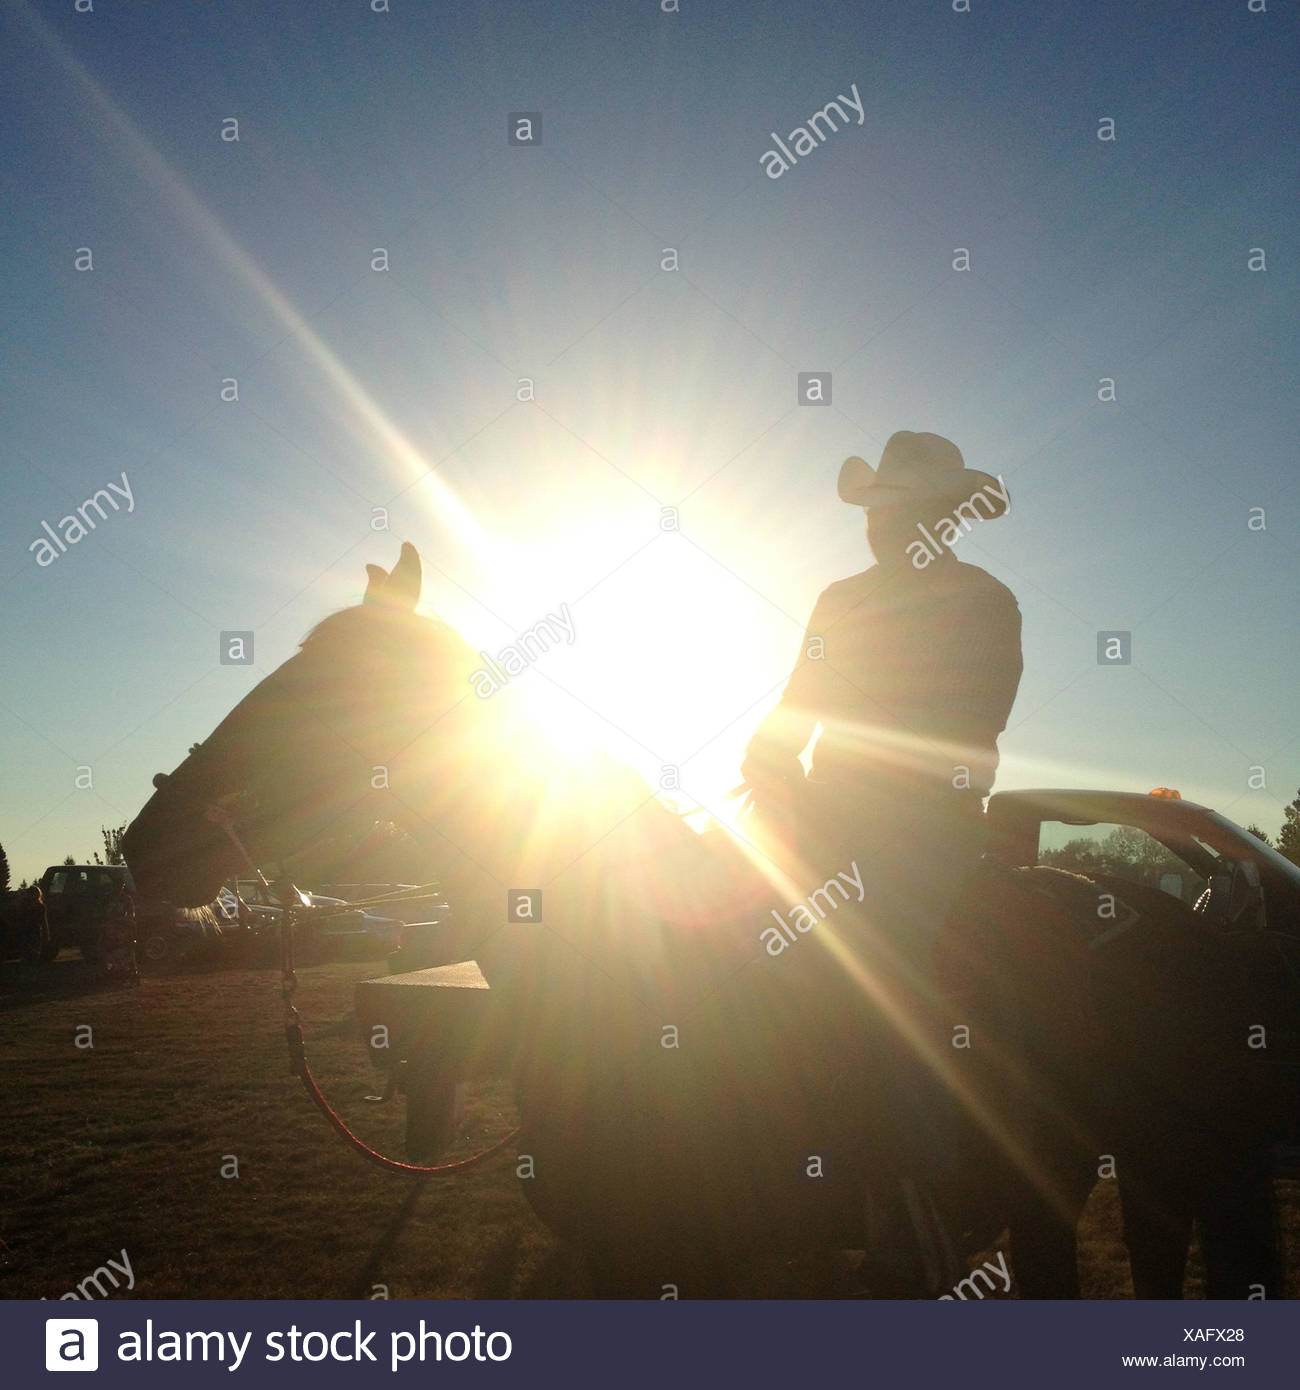 USA, Washington DC, Silhouette of a cowboy on horse - Stock Image